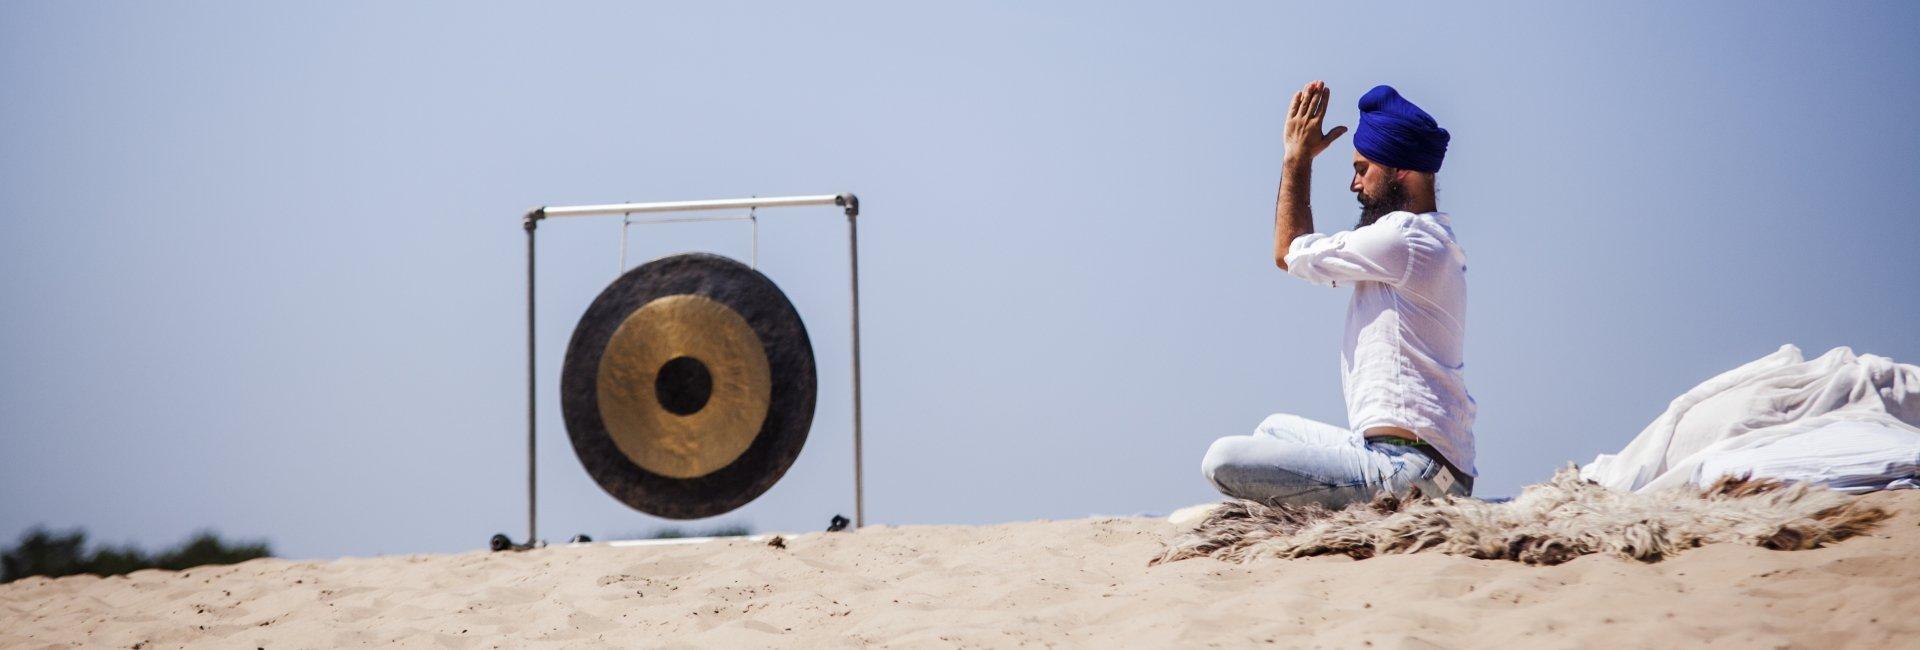 guru gian kundalini yoga expert leraar coach opleiding coaching workshops meditatie spiritueel spiritualiteit groei zakelijk persoonlijk